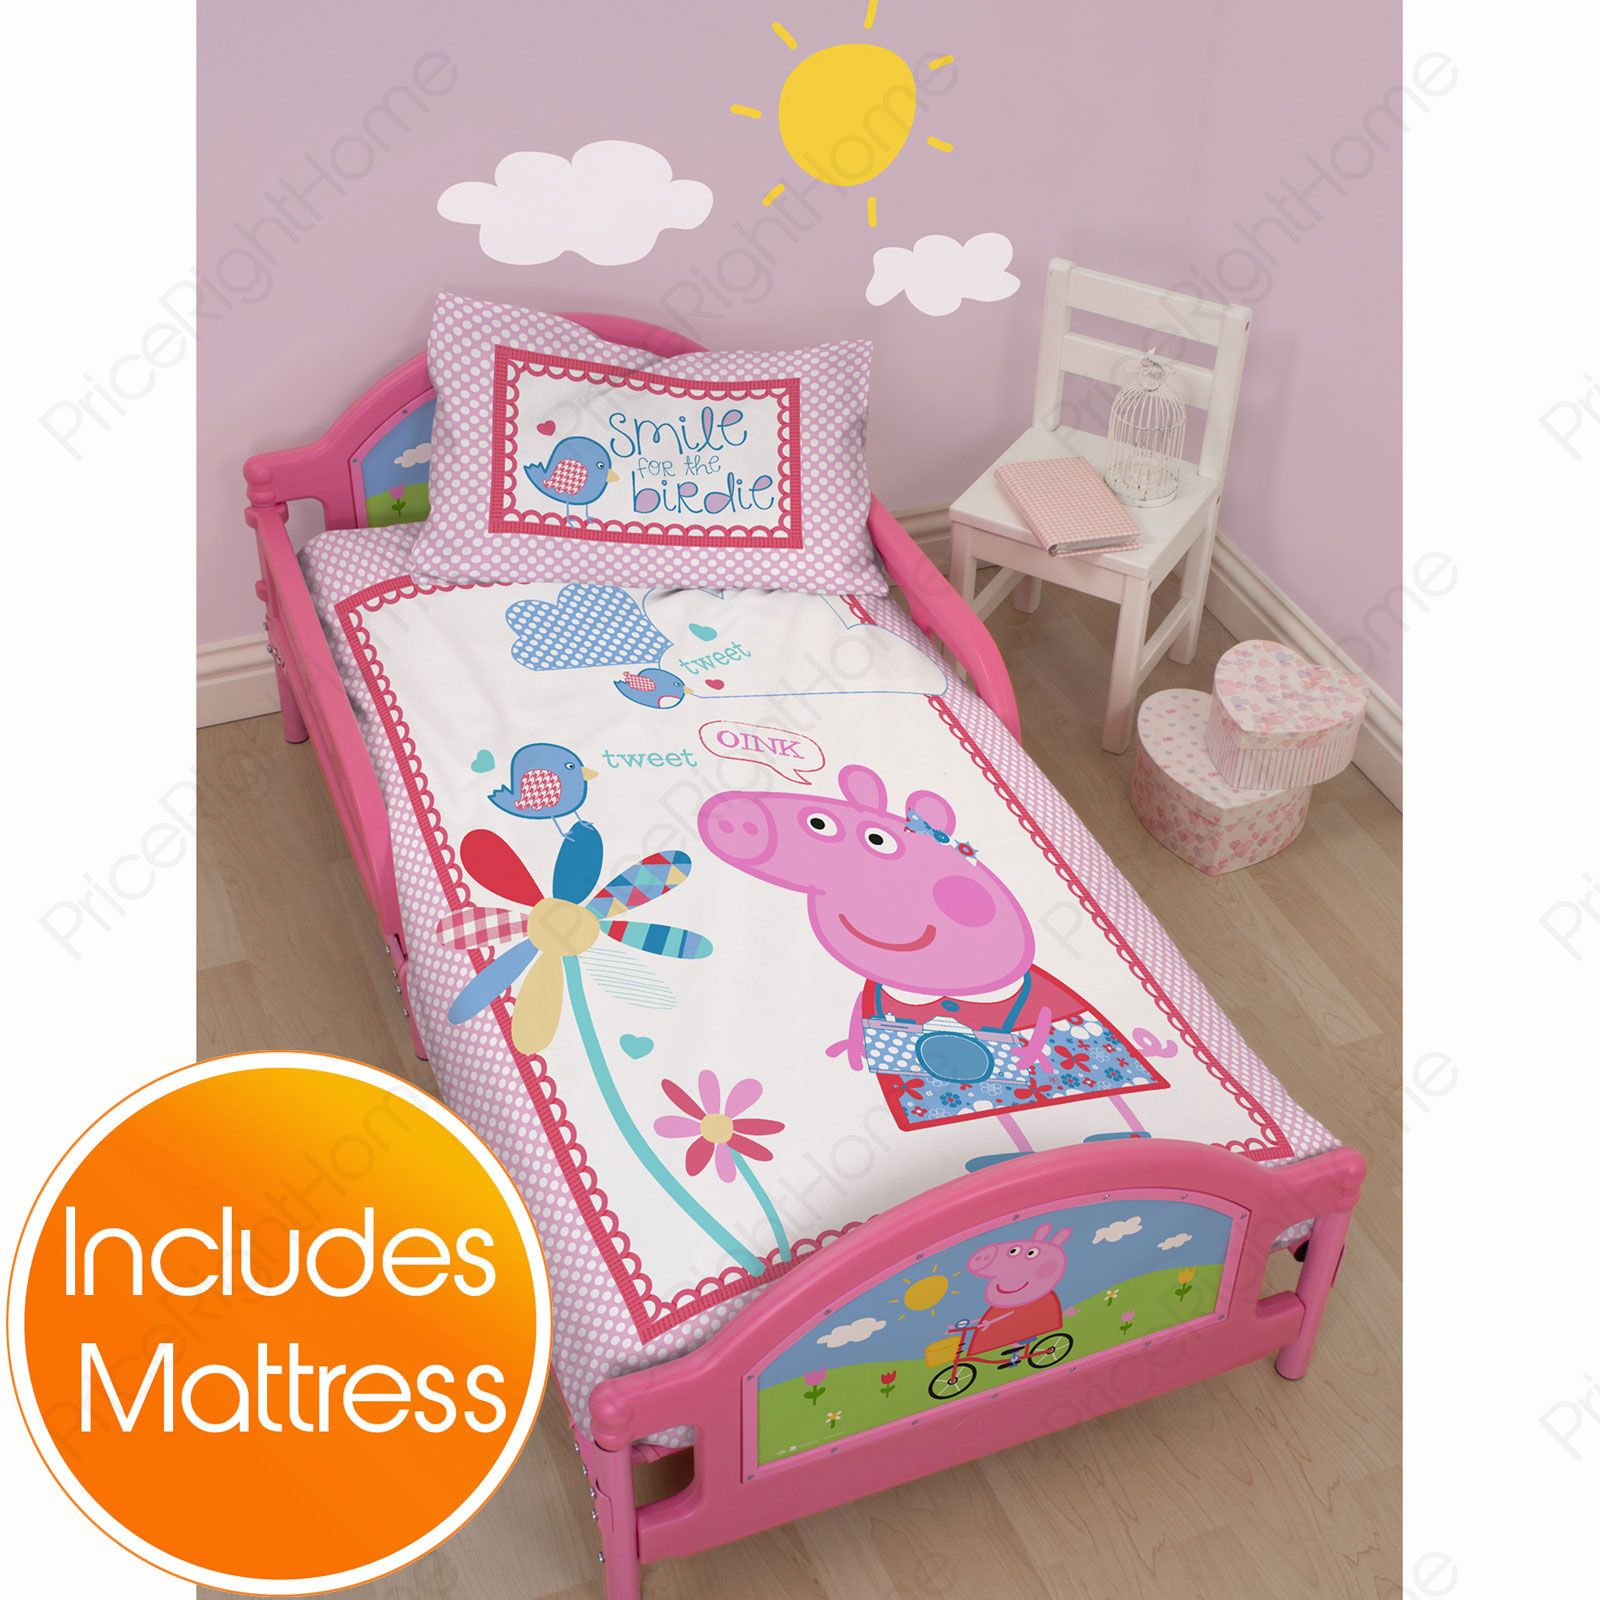 Peppa Pig Toddler Bed 28 Images Peppa Pig Toddler Junior Bed Shelf Underbed Storage Peppa